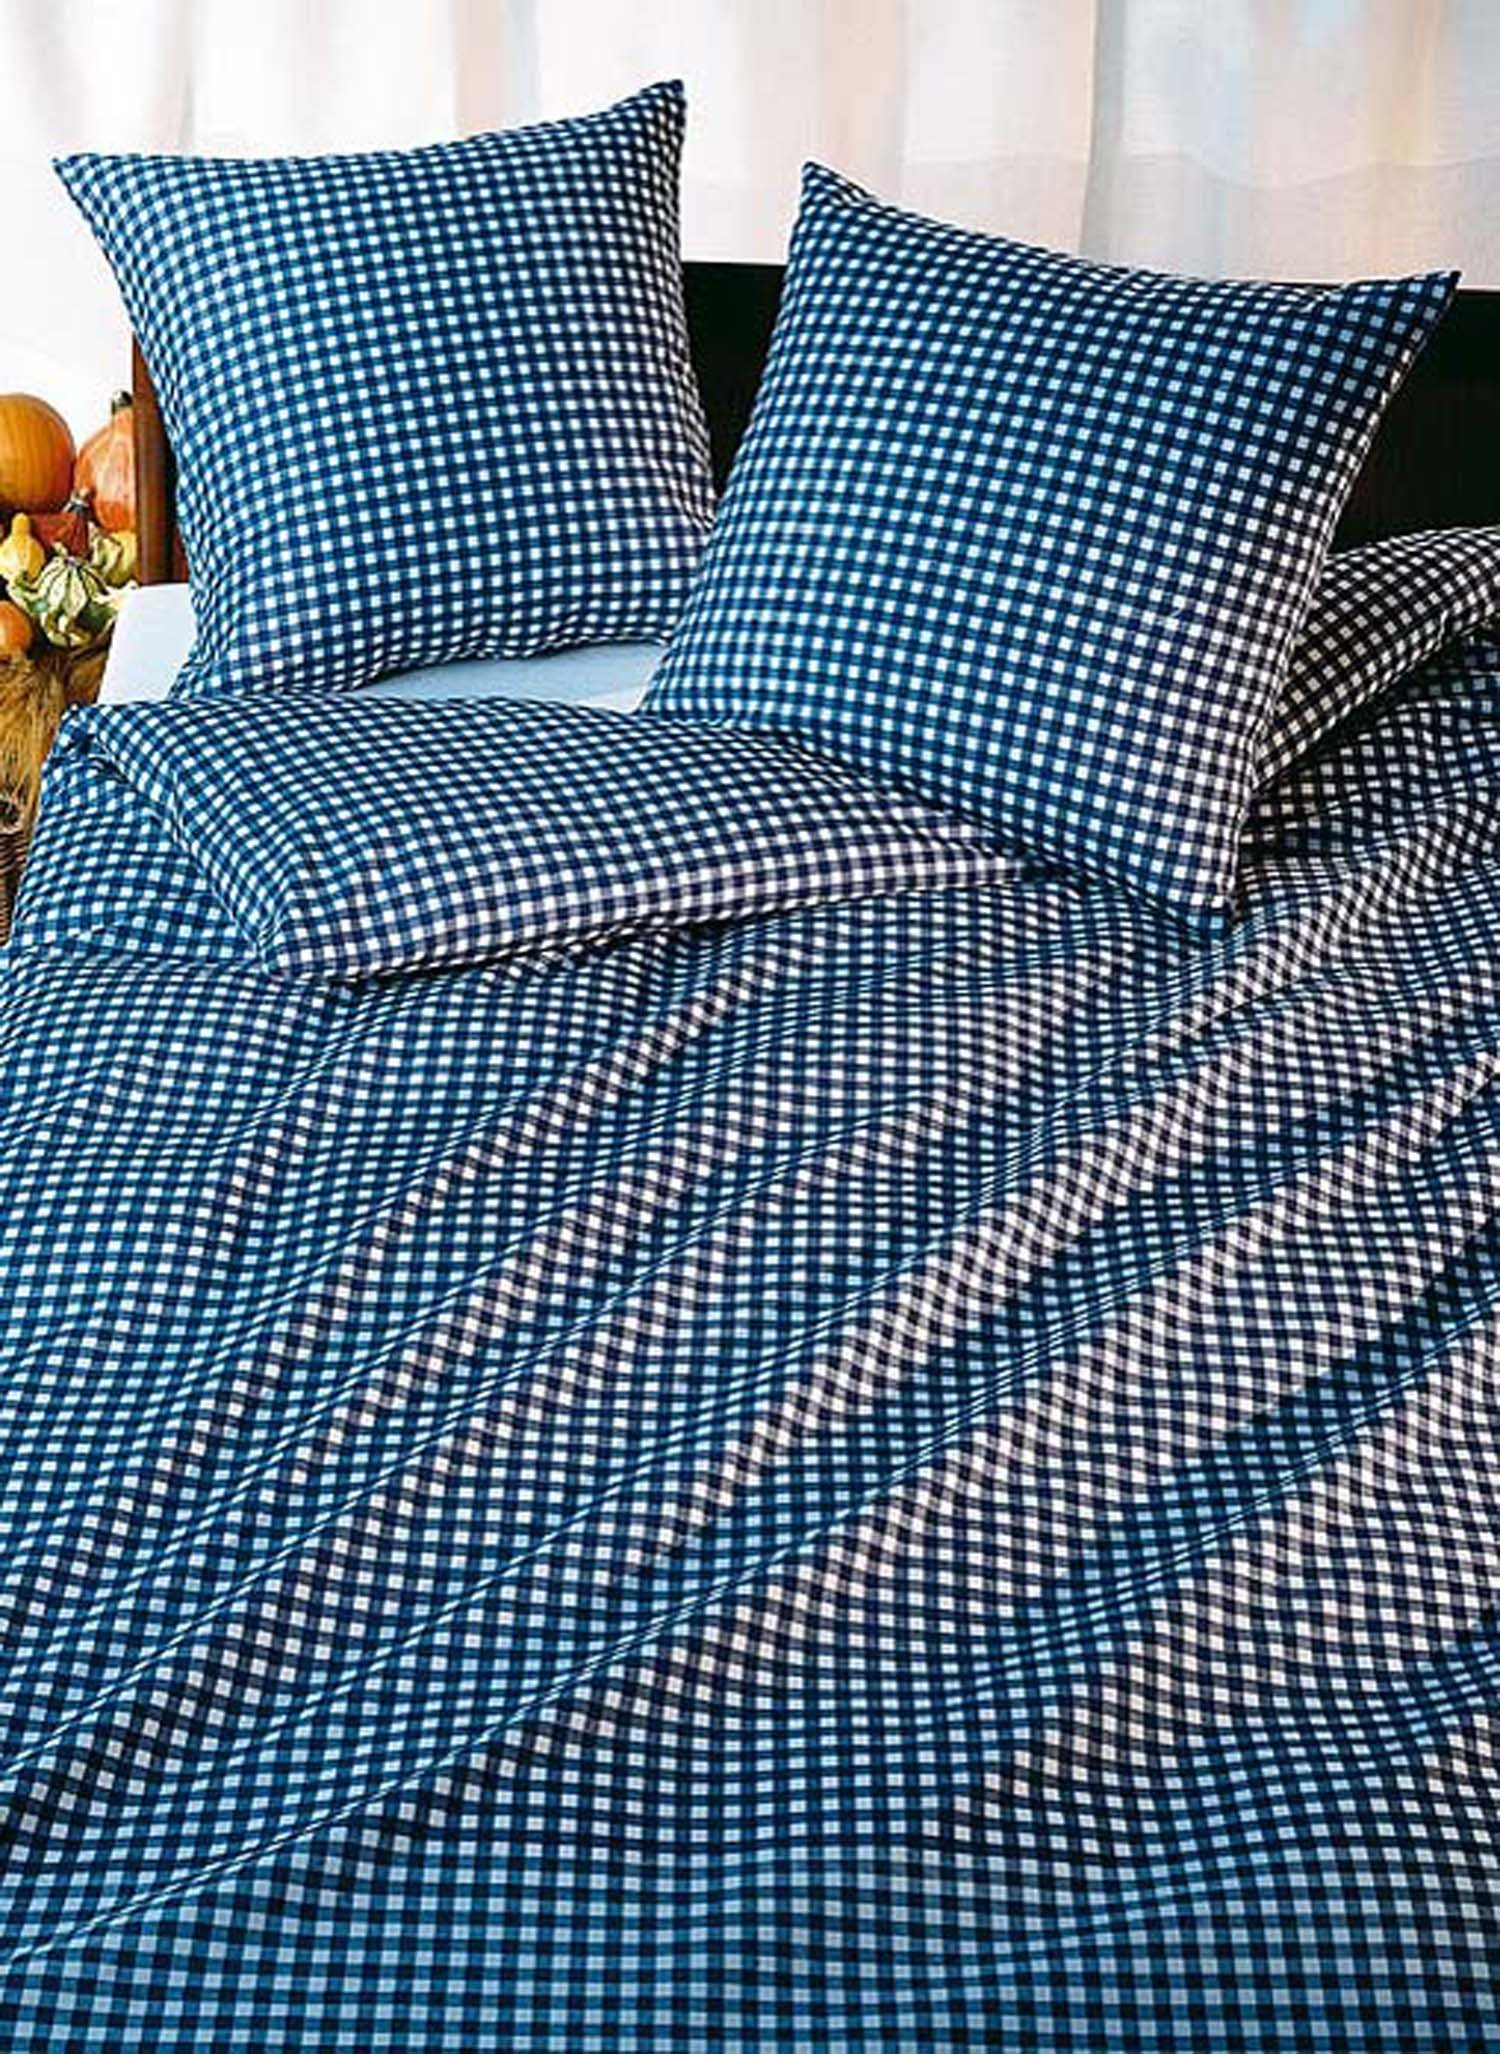 Garnitur DS Köl. blau/weiss 65x100+135x170cm - 2 - Ronja.ch